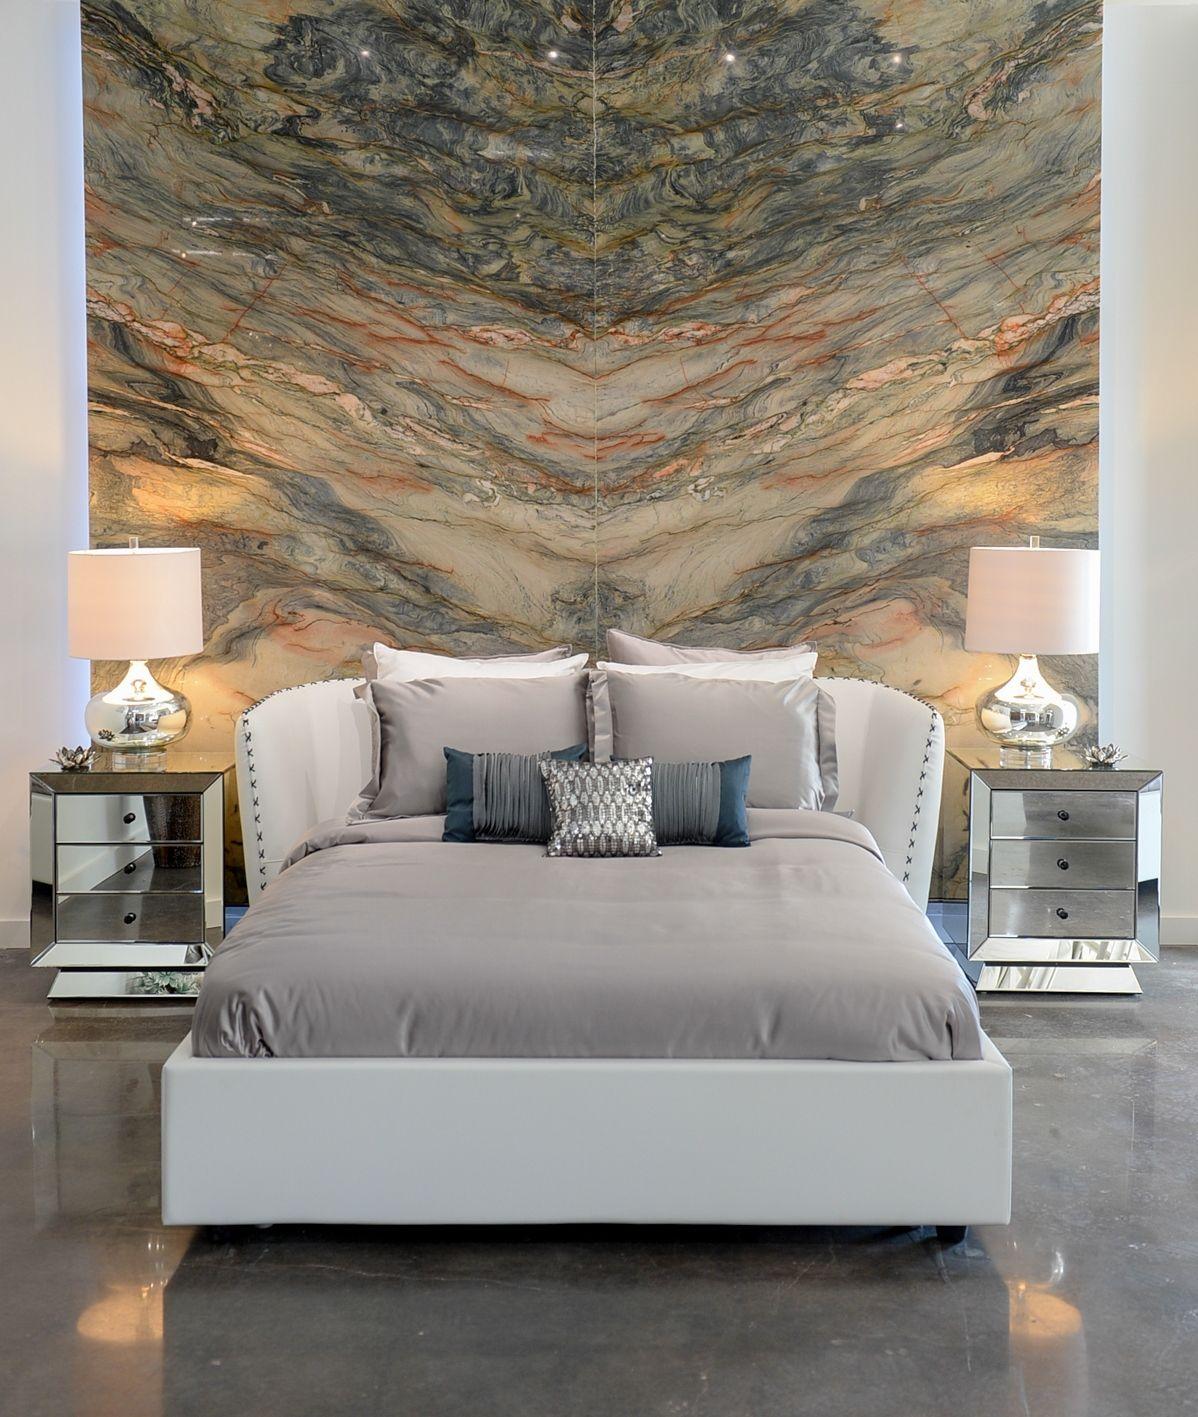 Dal Lx28 Bedroom Спальня Marble Bedroom Marble